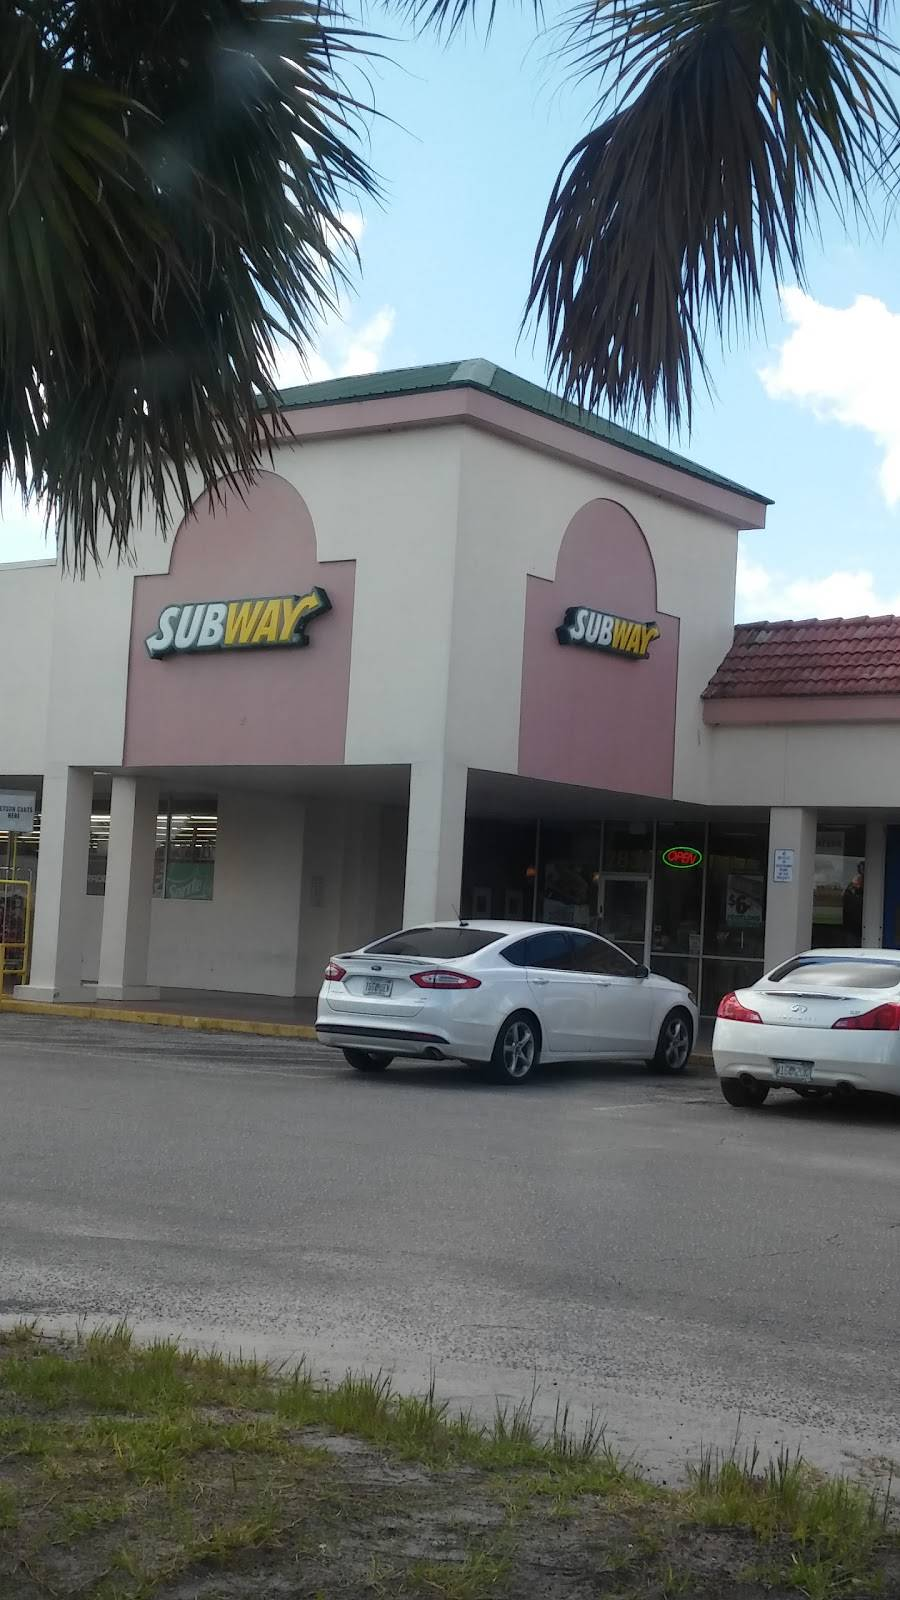 Subway | restaurant | 2834 Recker Hwy, Winter Haven, FL 33880, USA | 8632935011 OR +1 863-293-5011